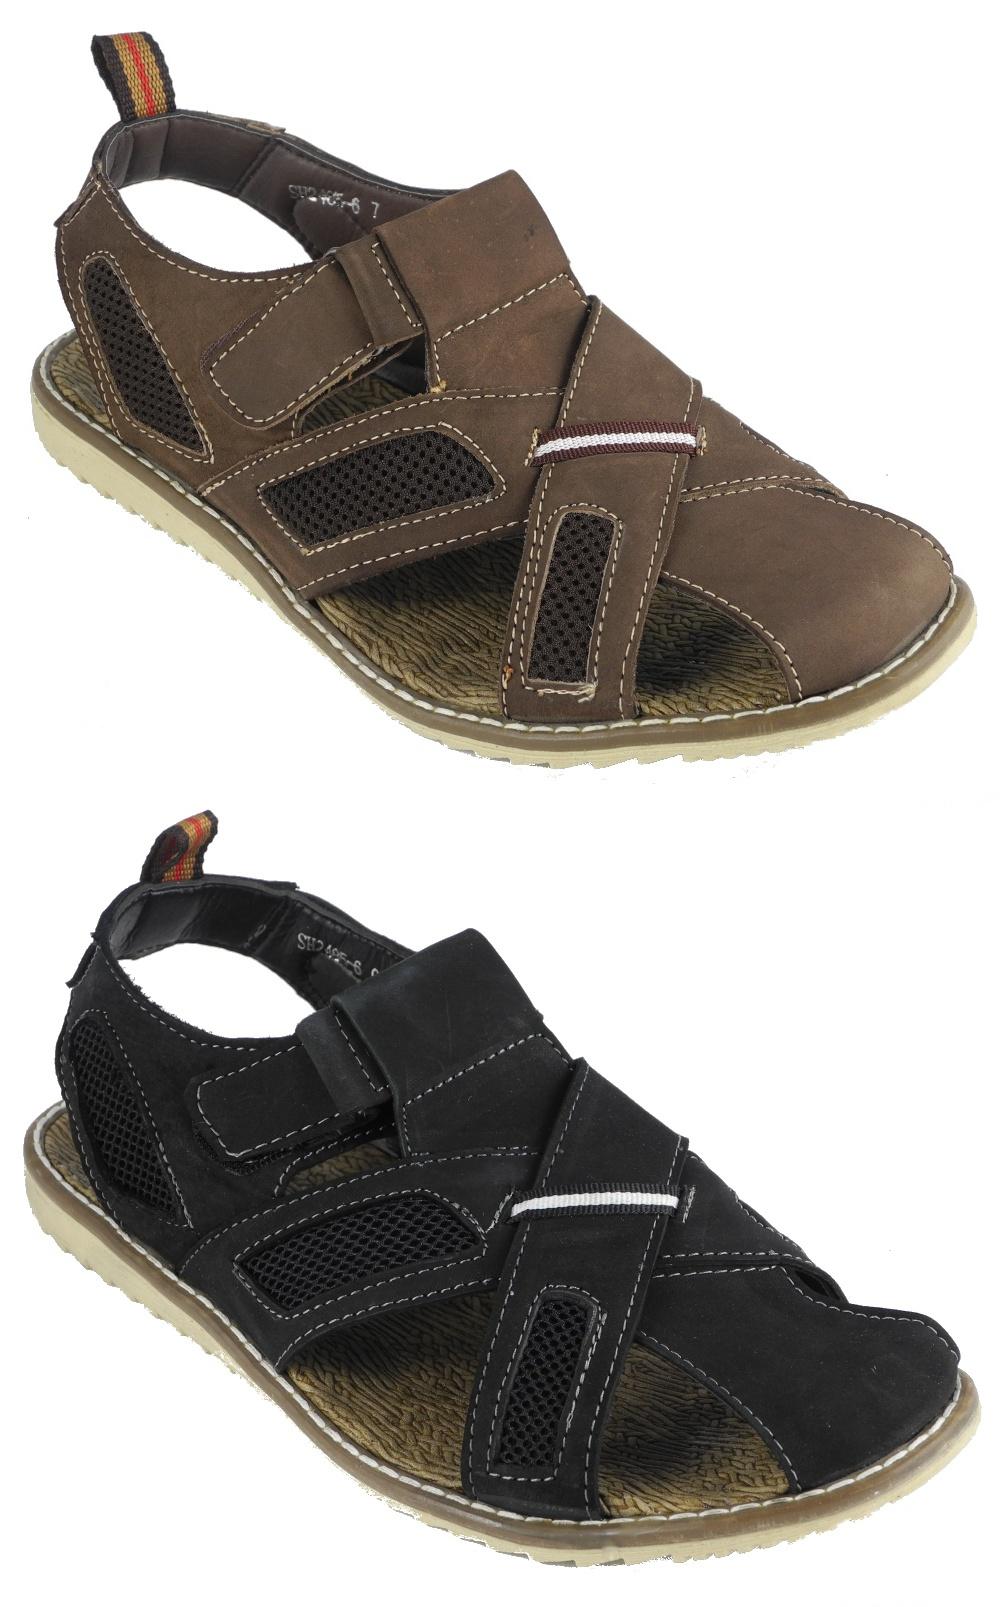 Black jesus sandals - Image Is Loading Mens Nubuck Leather Closed Toe Velcro Jesus Sandals